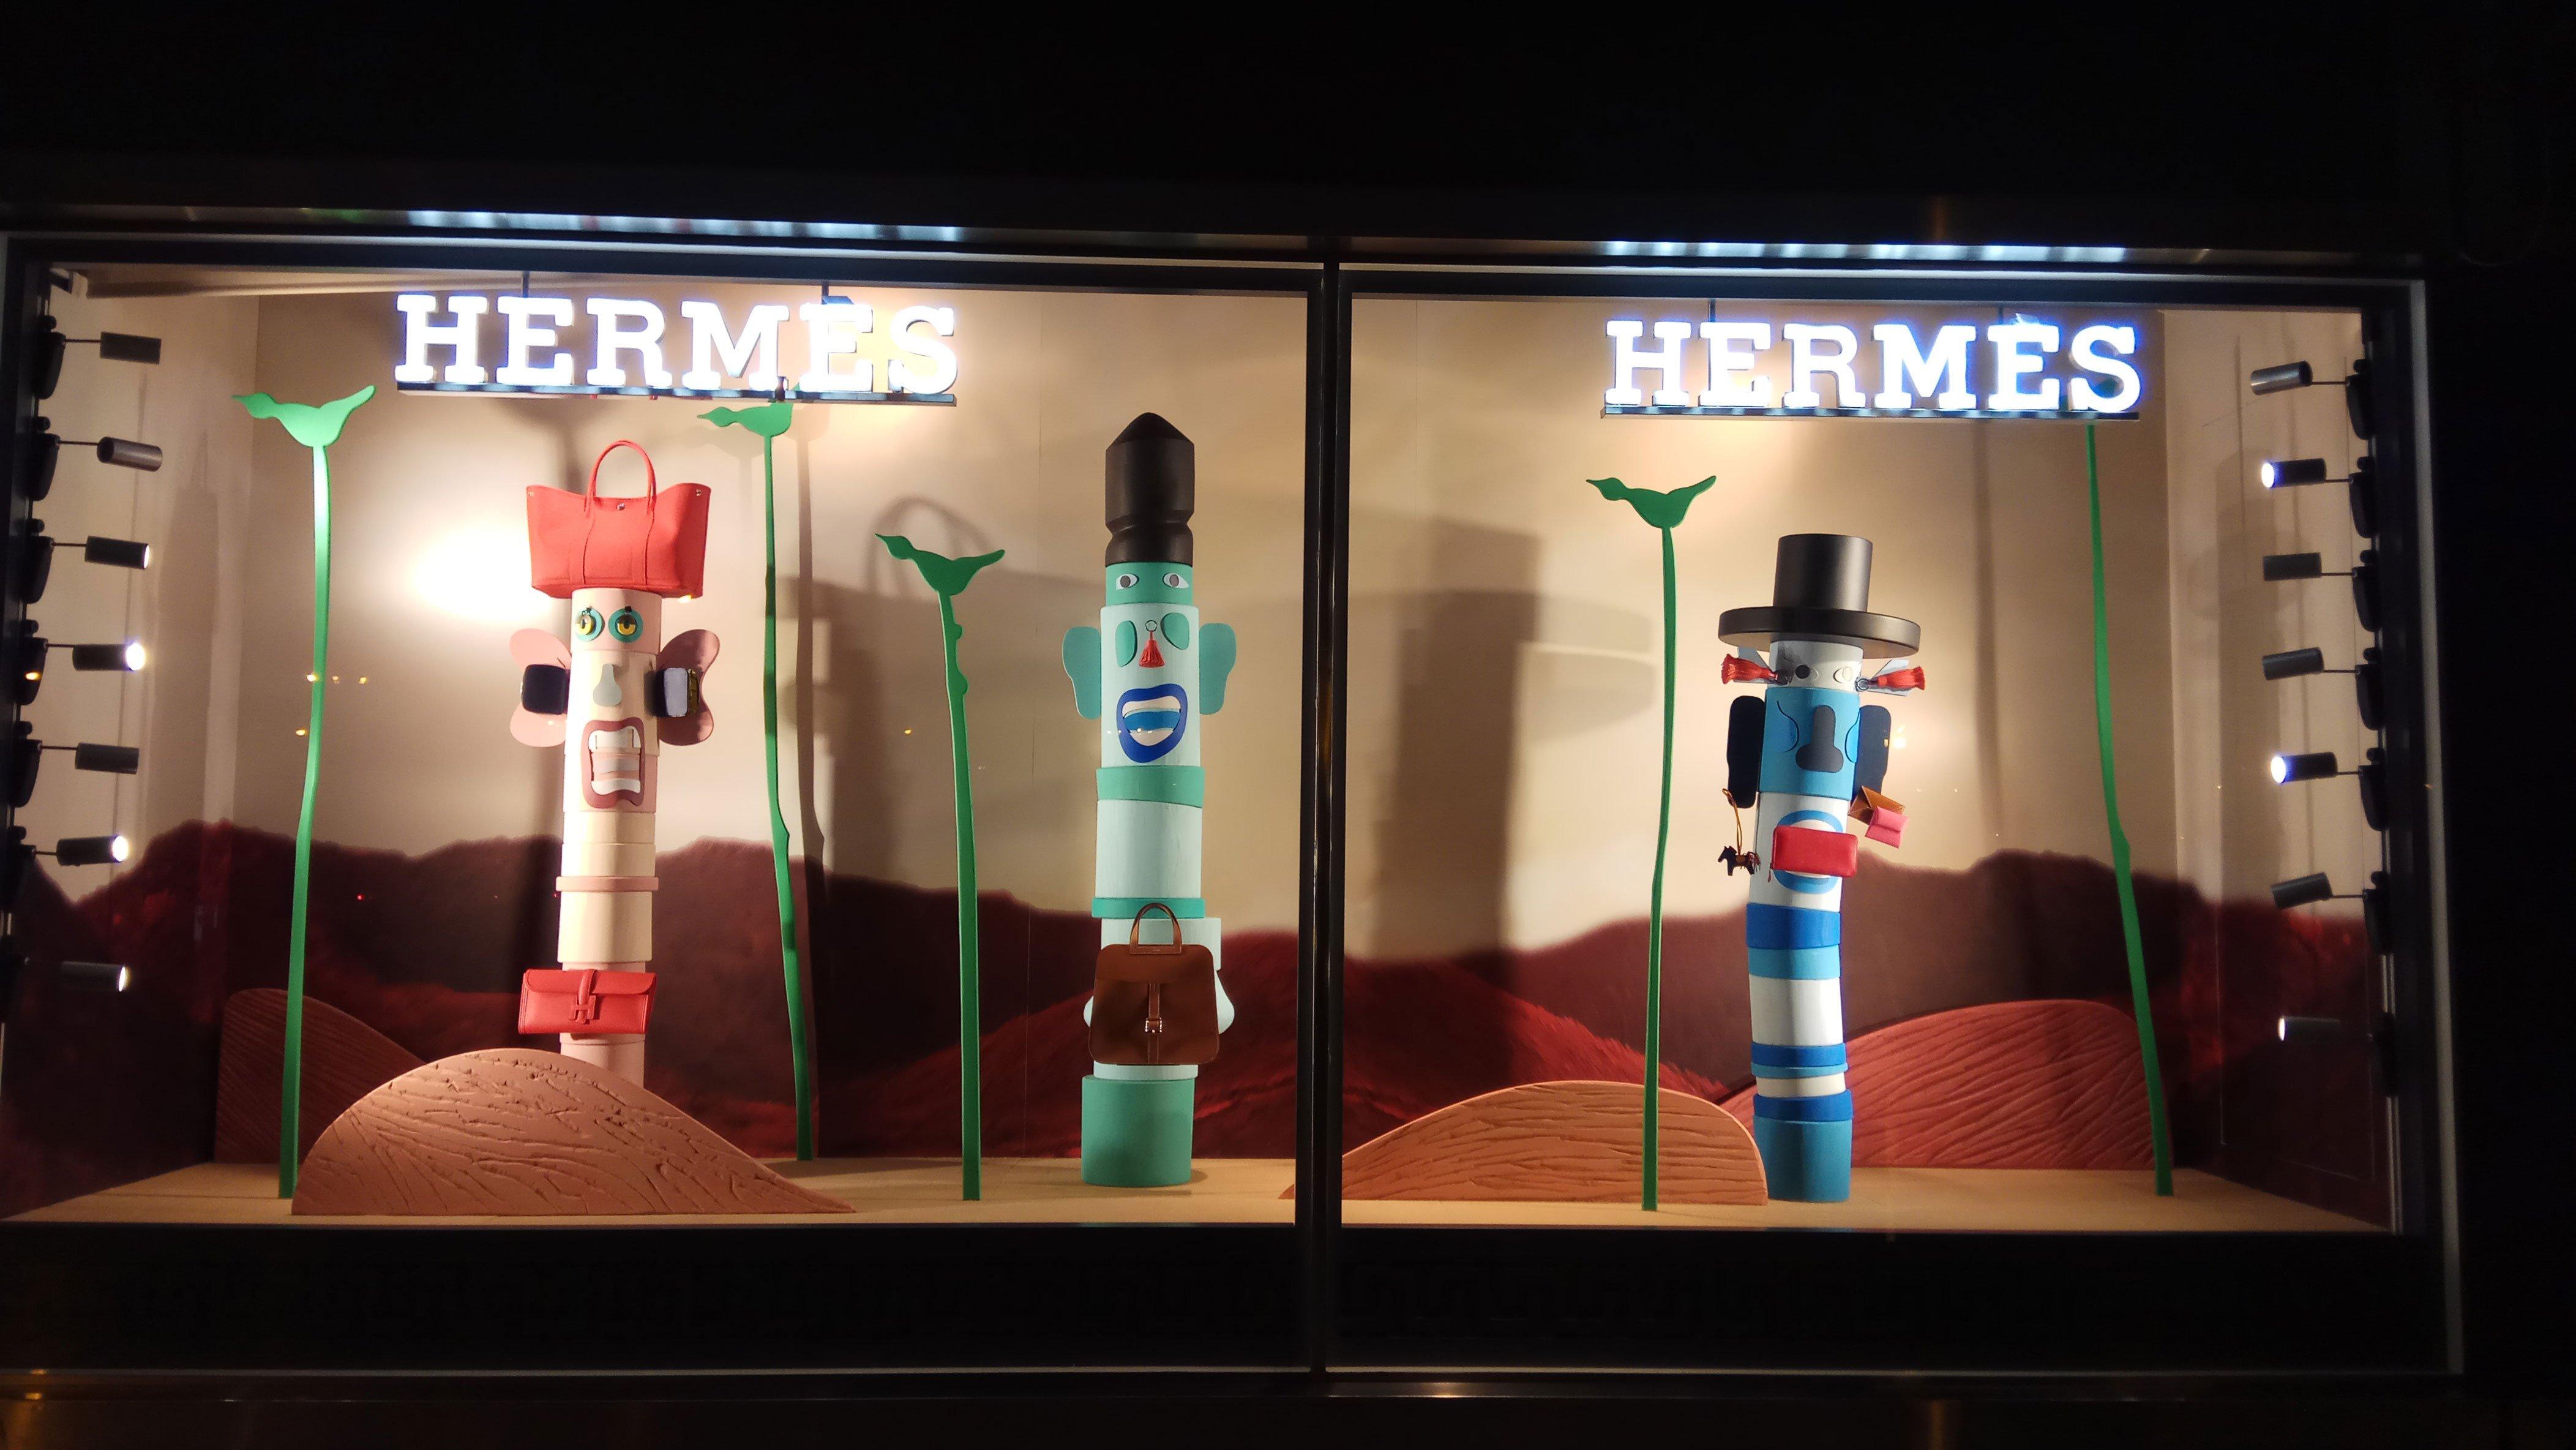 Modern Rituals The News Windows Display Of Herm 232 S